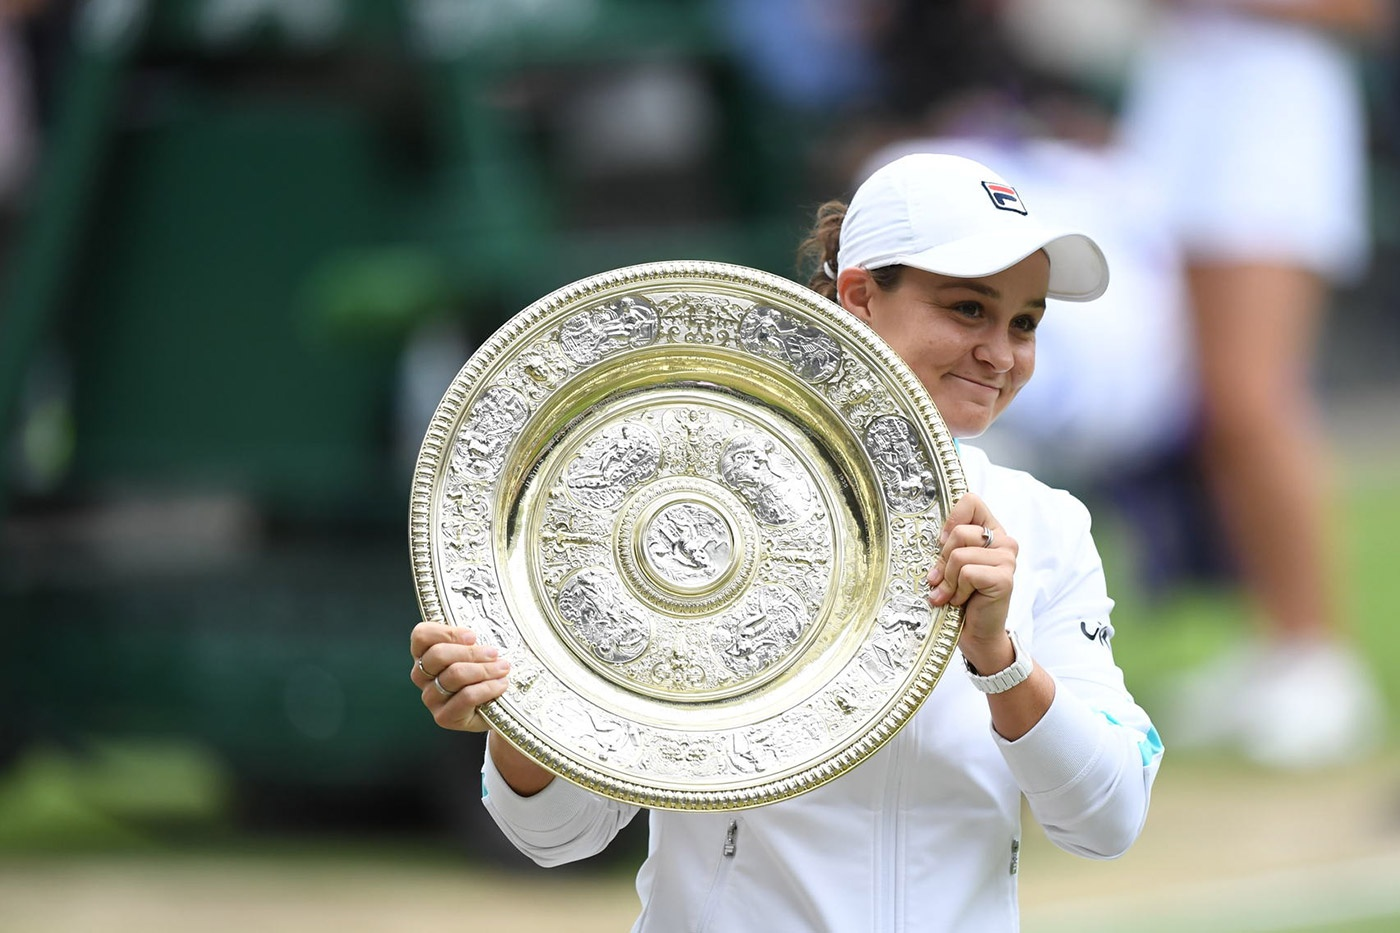 WTA Women's singles ranking Australian world No.1 defeats Karolina Pliskova in gripping three-set final